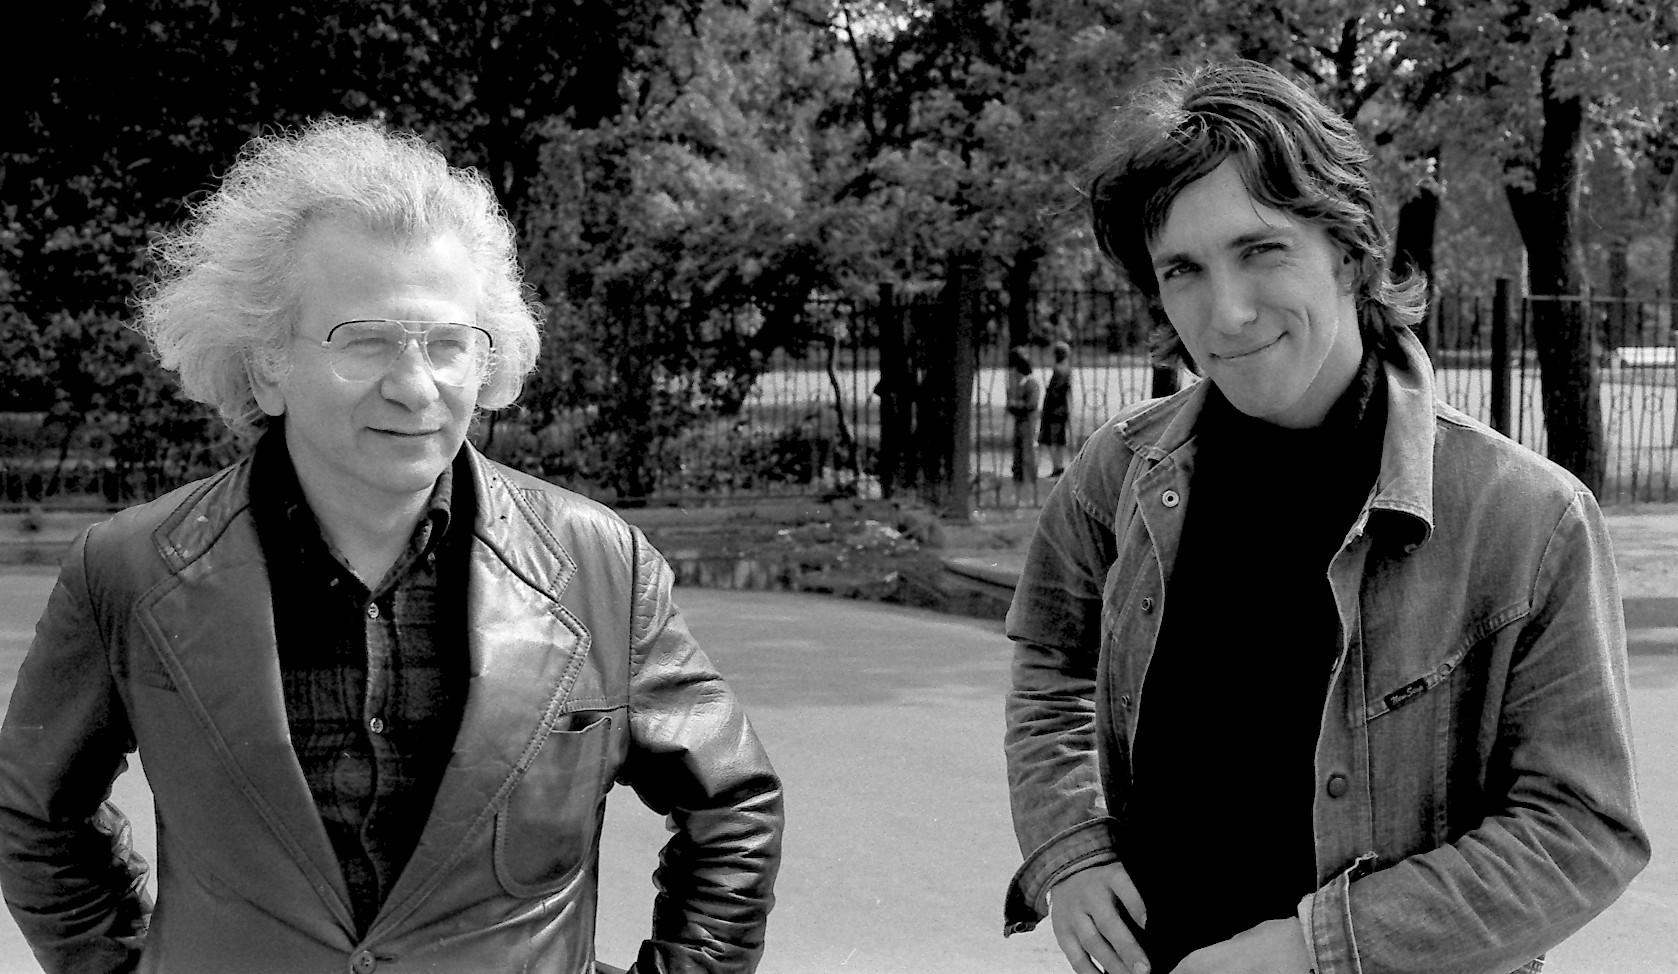 John Fischer + Sergey Kuryokhin - Leningrad 1981